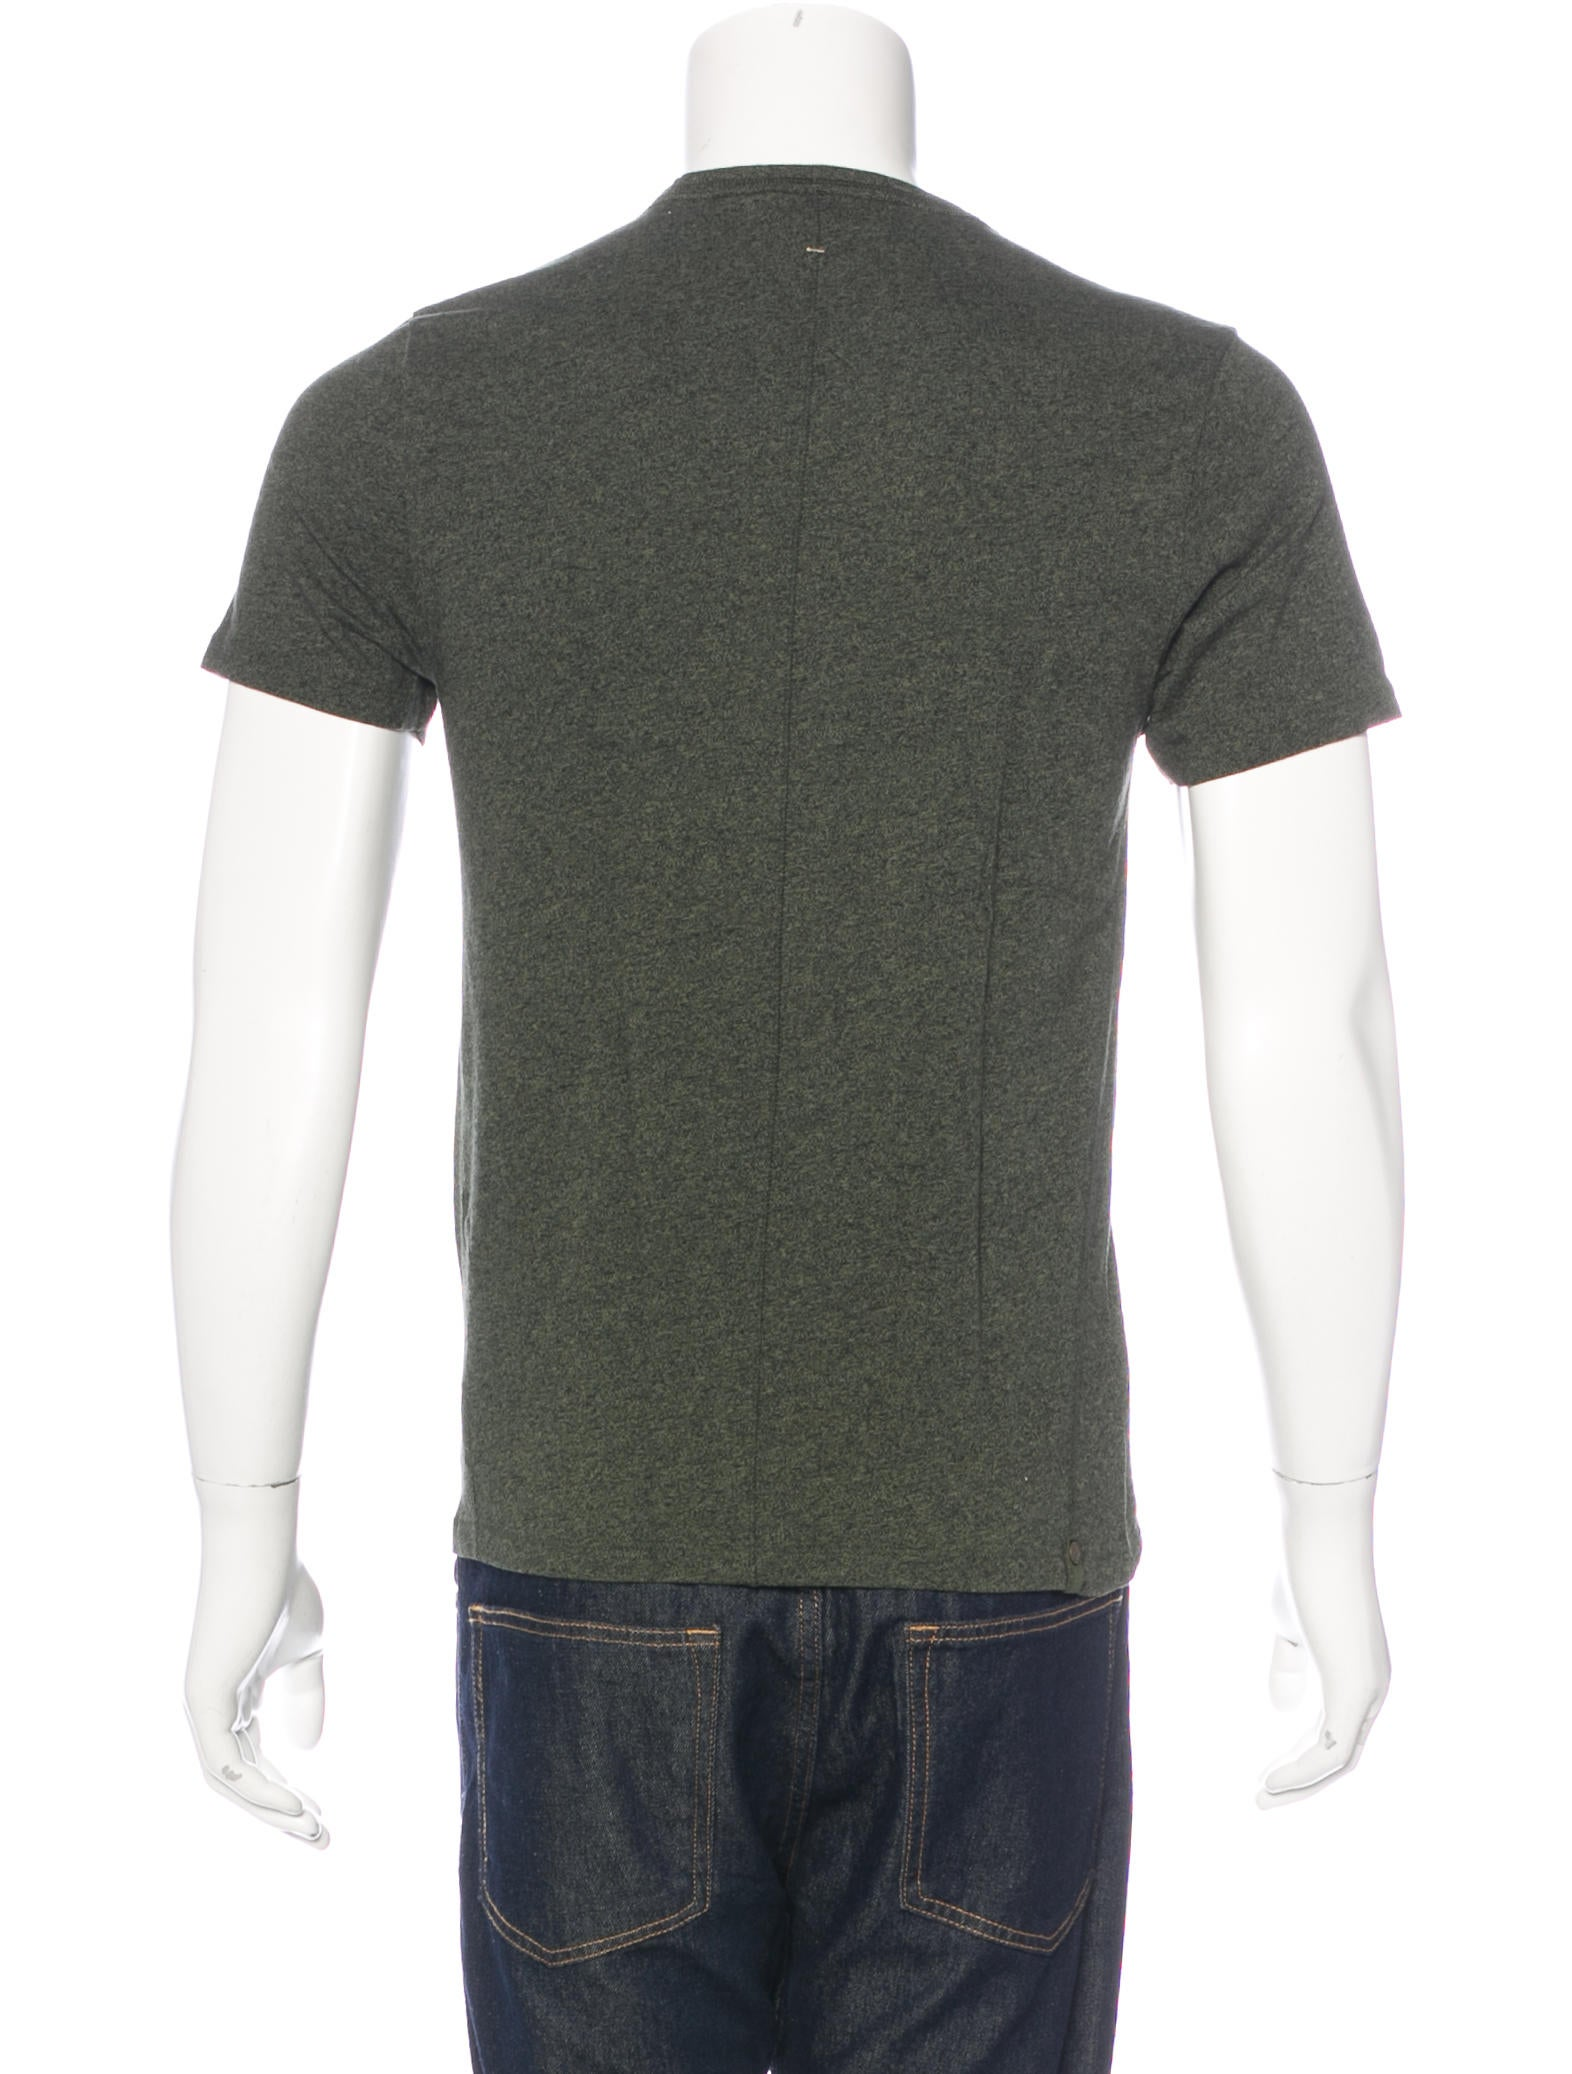 Rag Bone Crew Neck T Shirt Clothing Wragb67081 The